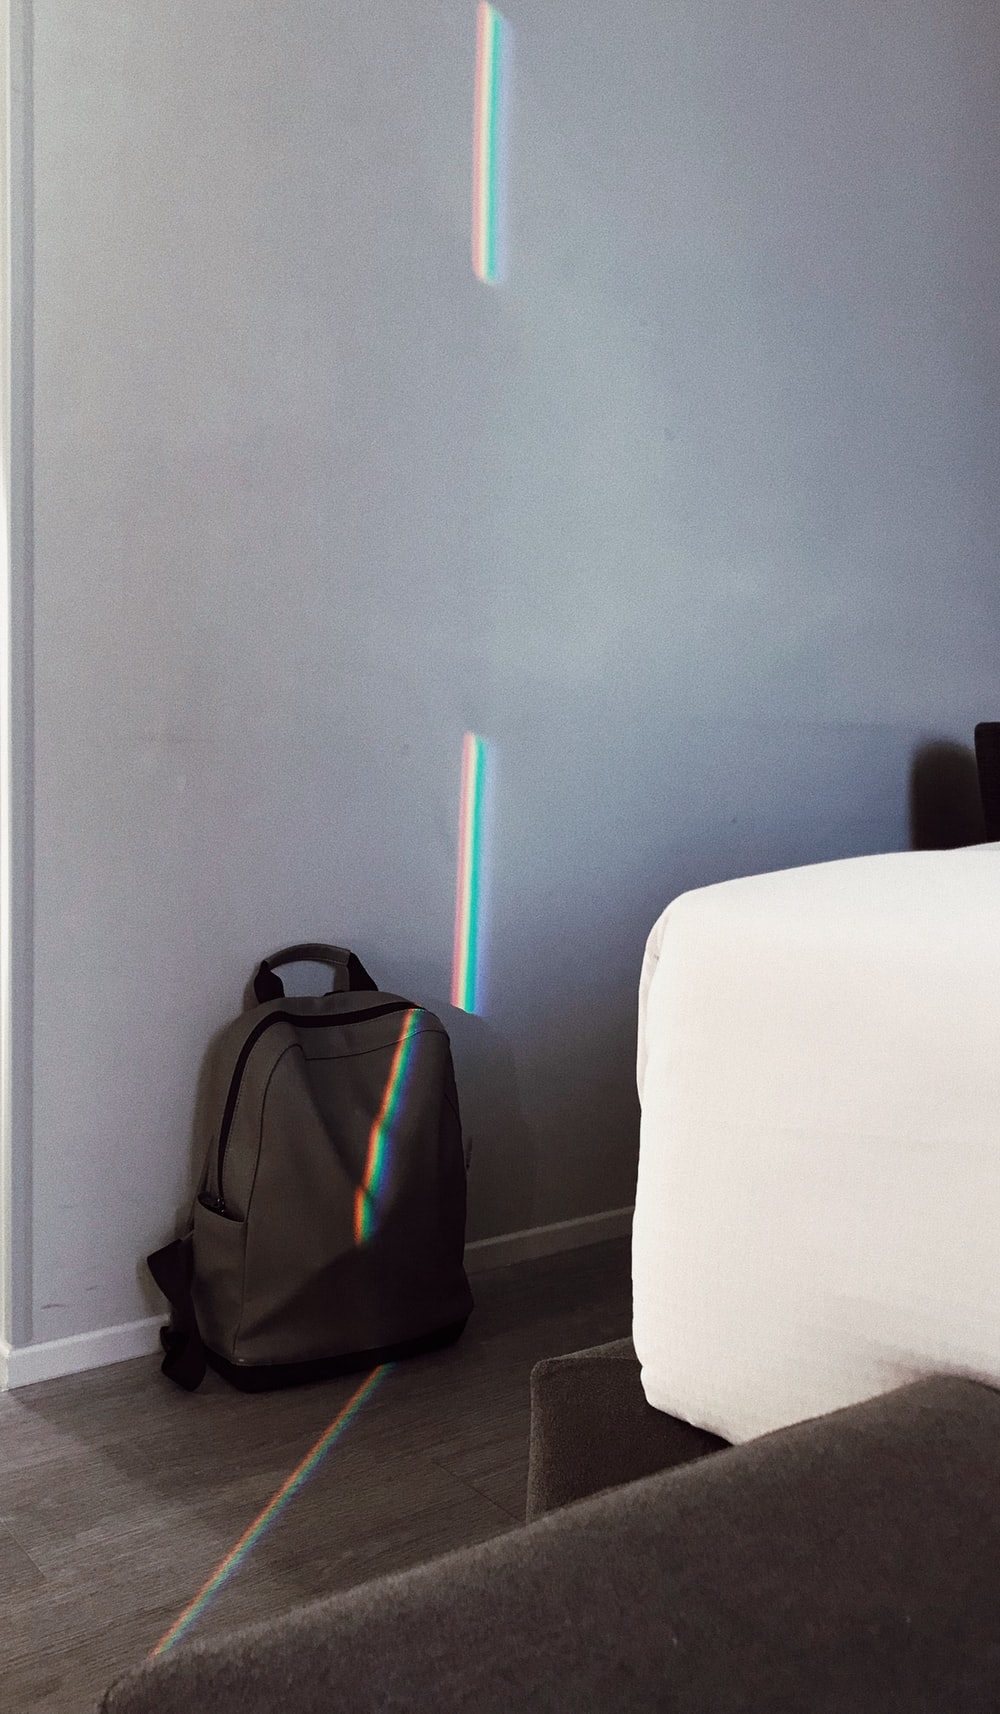 gray backpack beside wall